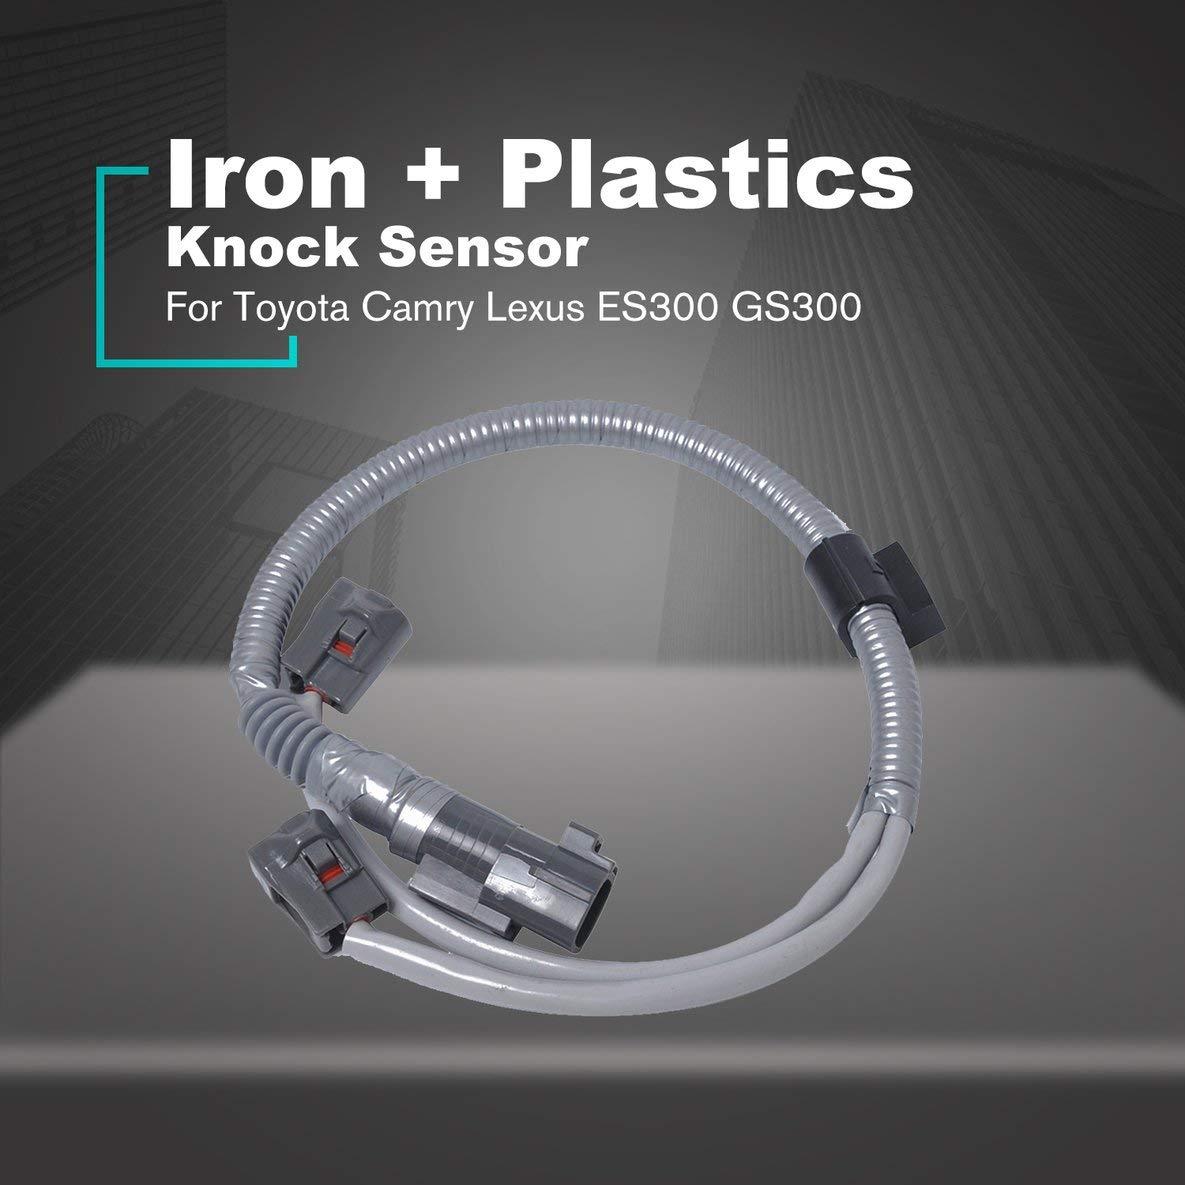 Noradtjcca 2Pcs Auto Car Knock Sensors Harness Kit For Toyota Camry Lexus ES300 GS300 Vehicle Repair Accessories Kit